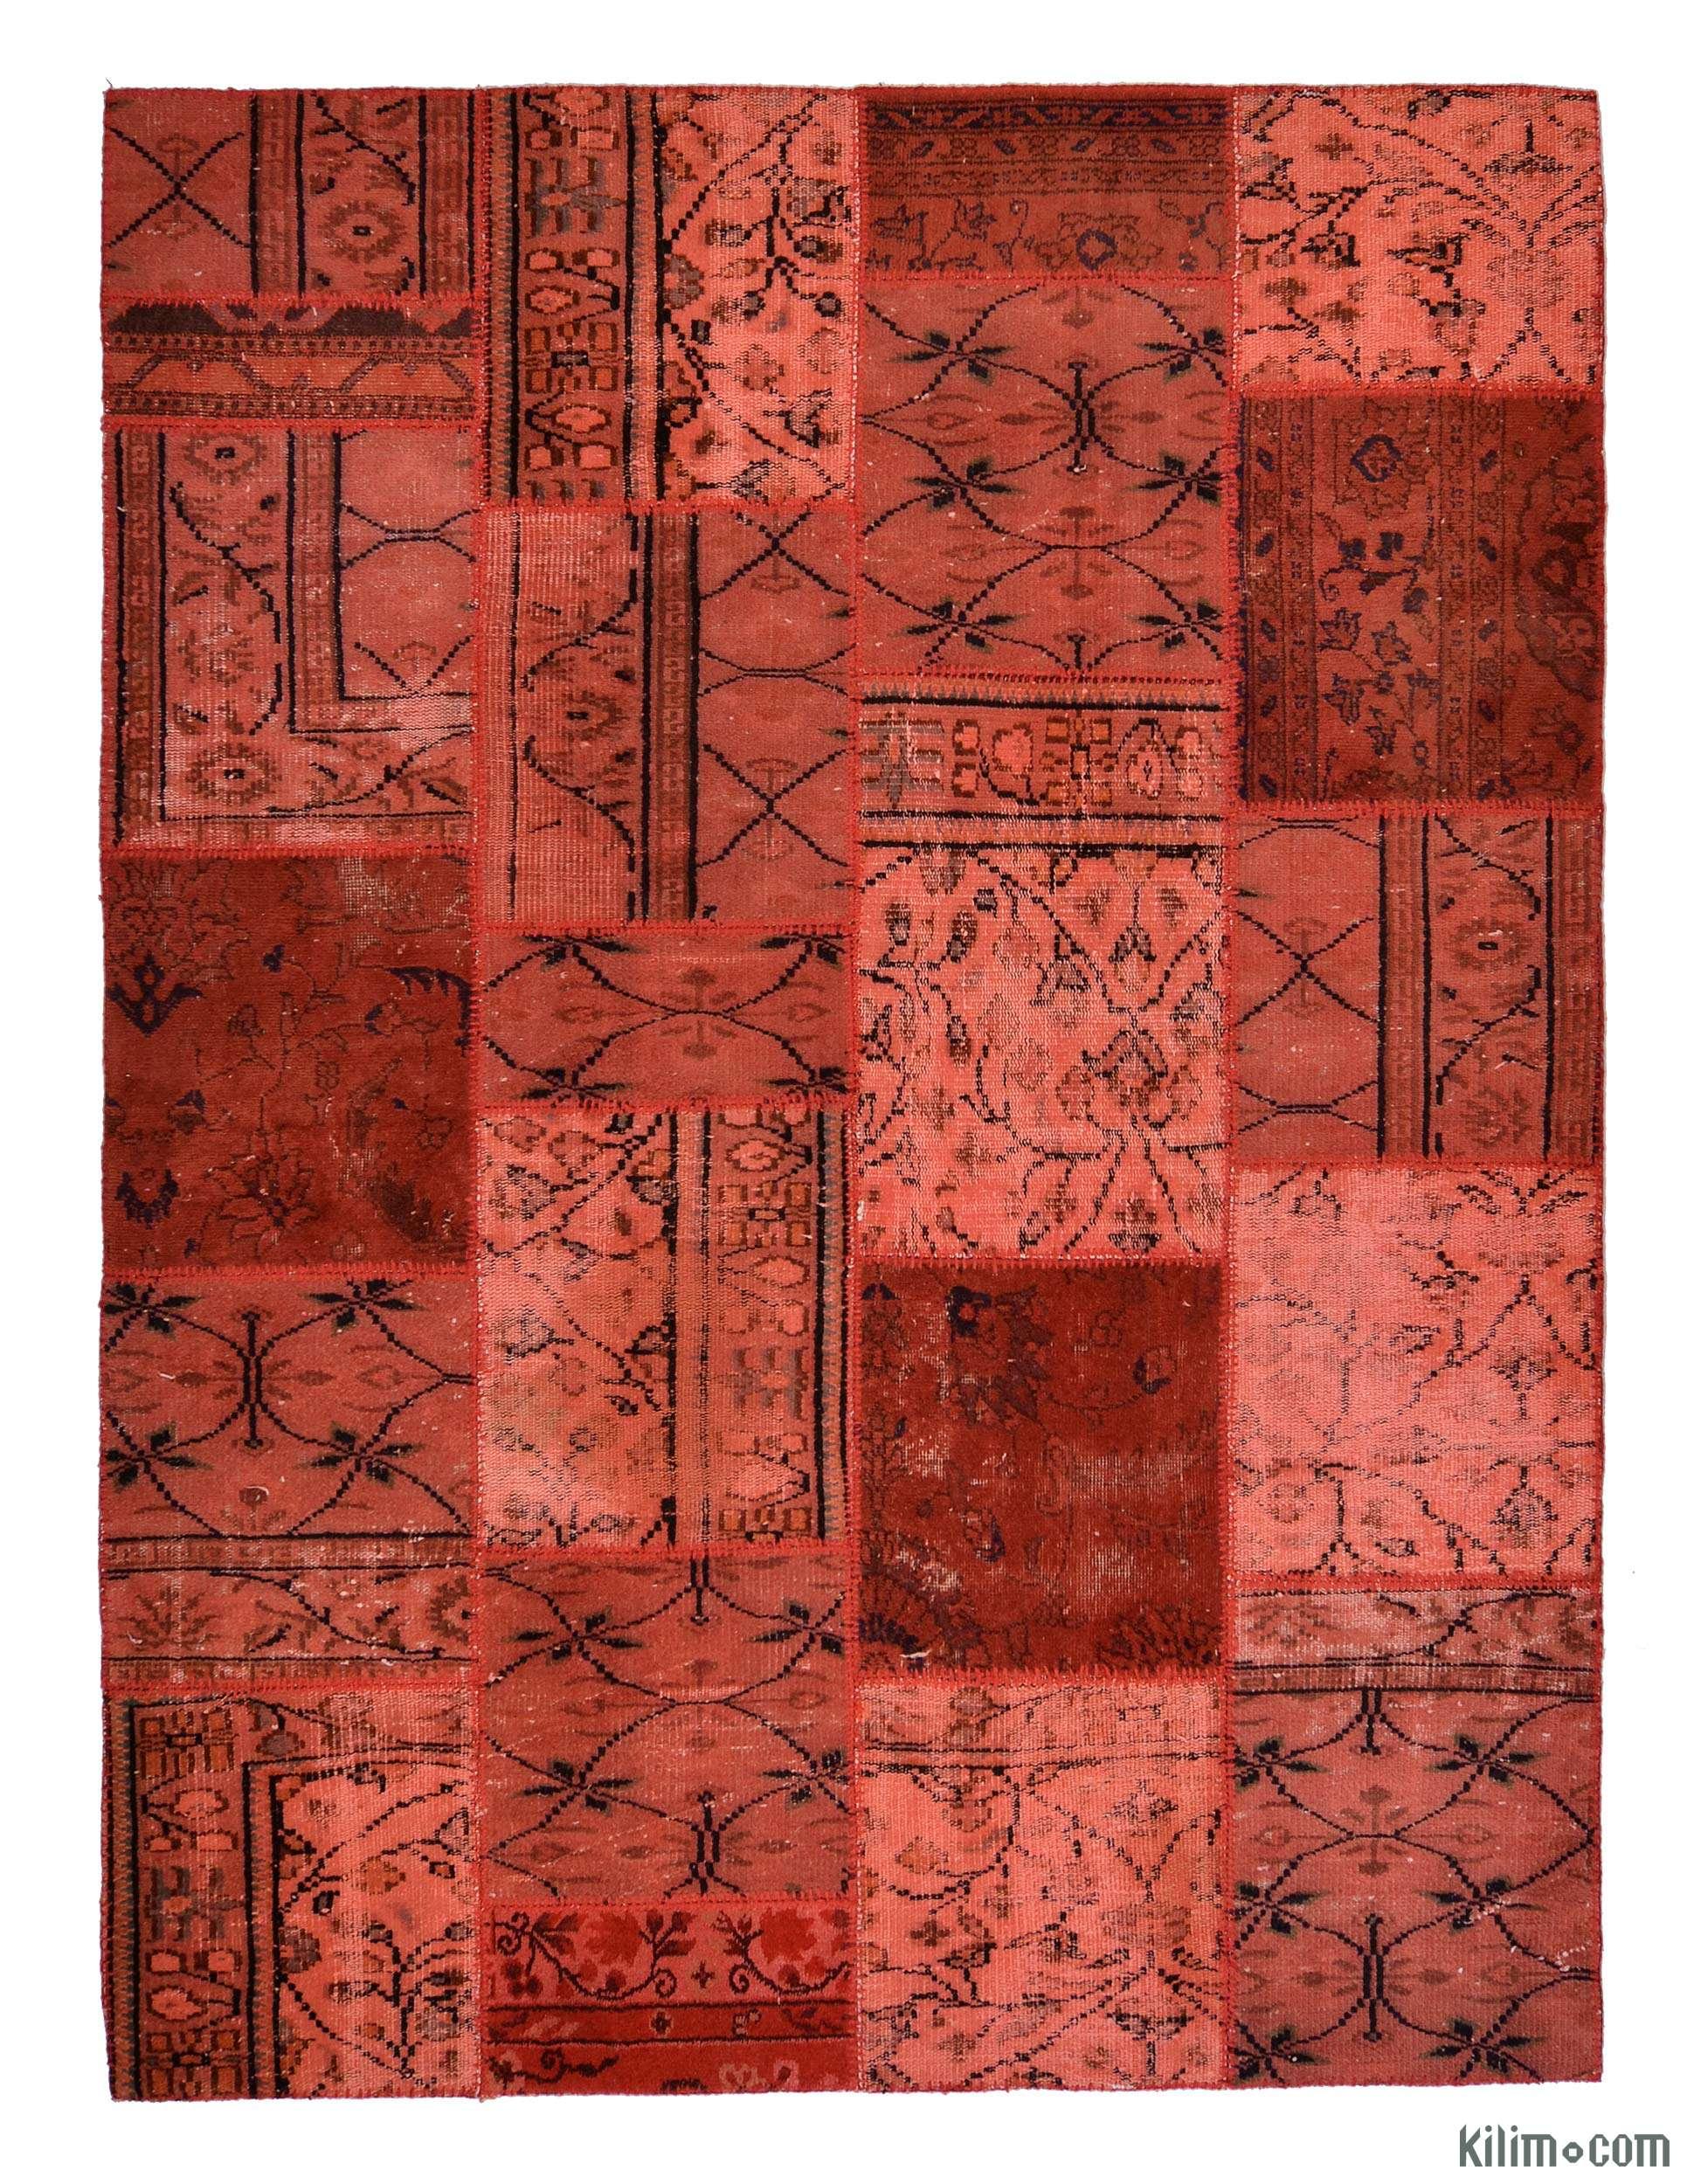 Overdyed Patchwork Rugs Kilim Rugs Overdyed Vintage